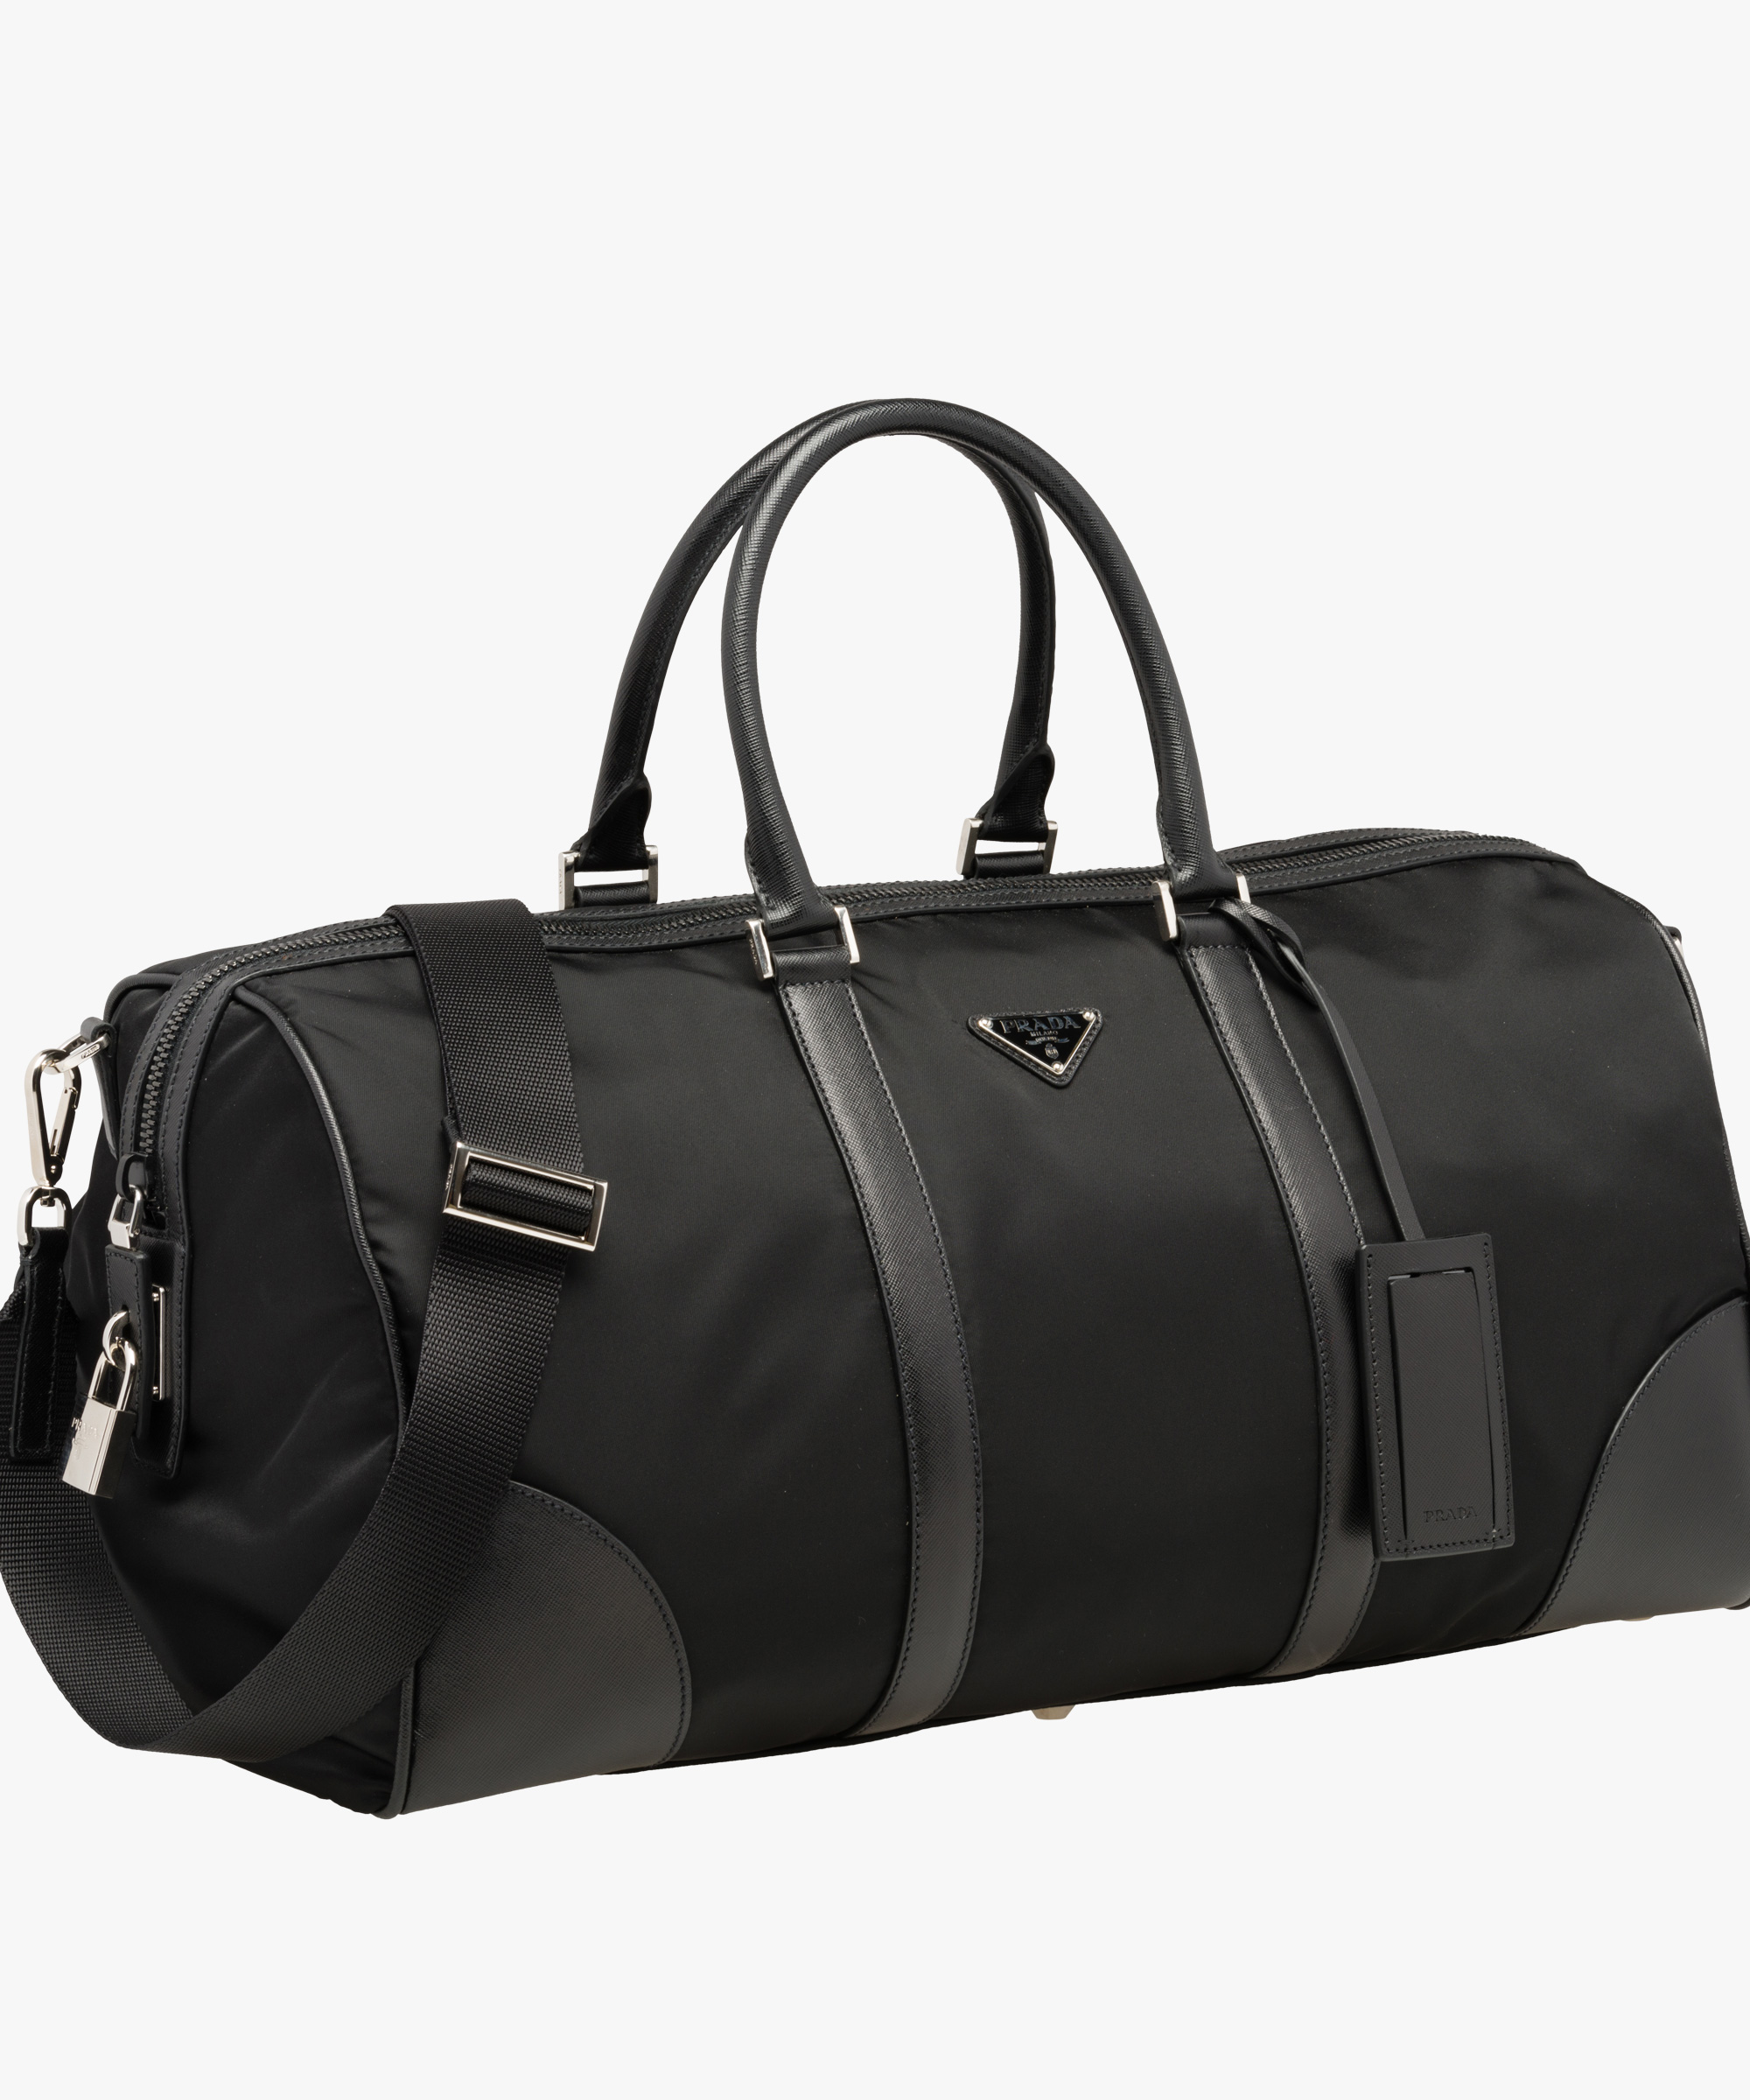 Prada Nylon Duffle Bag